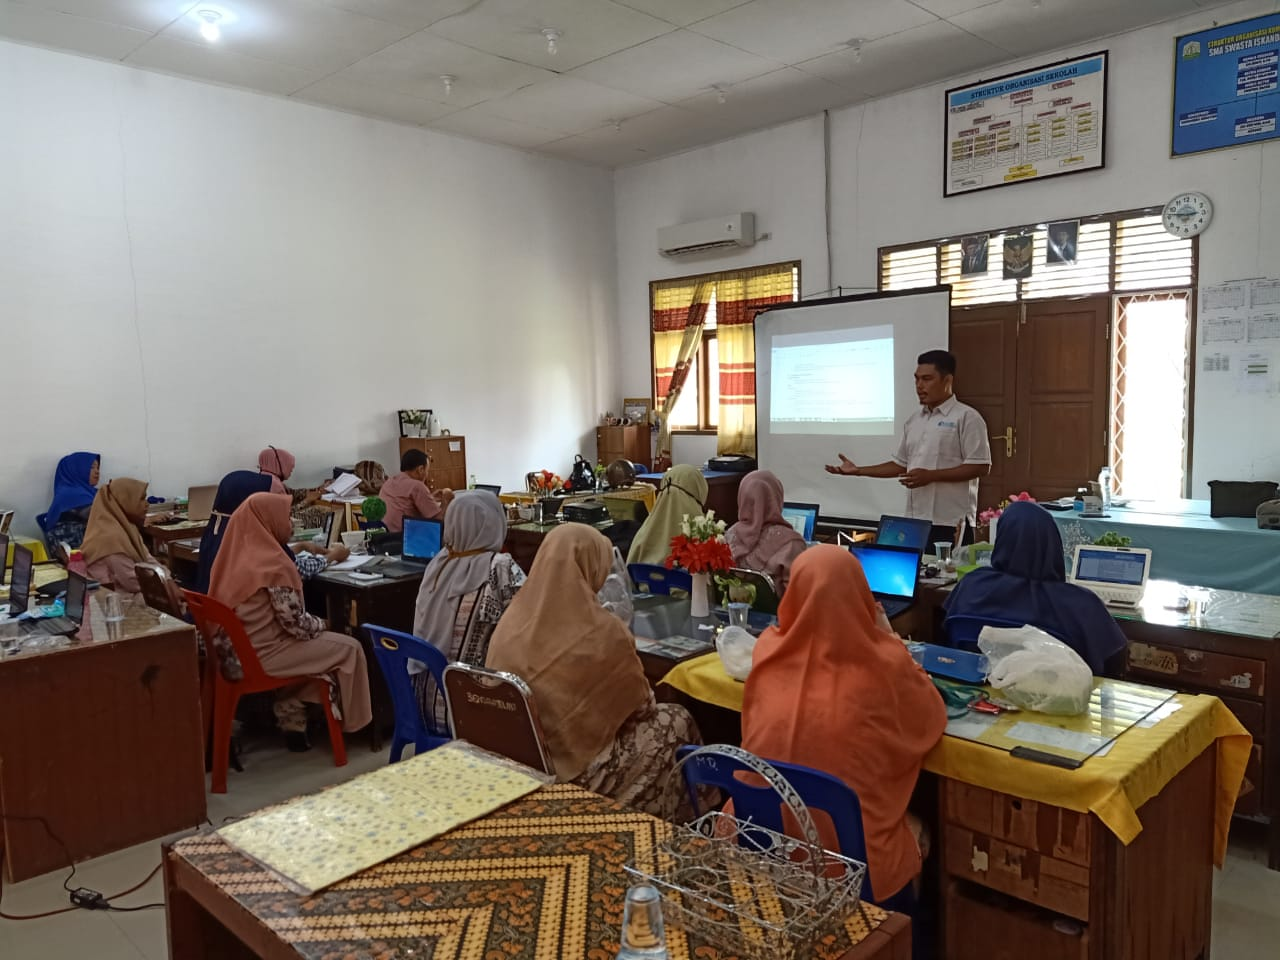 "ACEHSIANA.COM, Krueng Geukuh – Menjelang tahun ajaran baru 2020/2021, SMAS Iskandar Muda atau lebih dikenal dengan SMA PIM melatih guru tentang penyusunan Rencana Pelaksanaan Pembelajaran (RPP) inspiratif atau RPP satu halaman. Selain itu para guru juga dilatih penerapan Belajar dari Rumah (BDR) menggunakan fasilitas Google. Kegiatan tersebut berlangsung pada tanggal 8-9 Juli 2020 di gedung SMAS Iskandar Muda. Mereka dilatih oleh Ketua Ikatan Guru Indonesia (IGI) Kota Lhokseumawe, Jon Darmawan SPd MPd. Kepala SMAS Iskandar Muda, Salmiati SPd menjelaskan bahwa kegiatan tersebut dilaksanakan agar para guru mampu menyusun RPP satu halaman yang menginspirasi guru dan peserta didik sesuai dengan panduan dari Pusat Kurikulum dan Pembelajaran Kementerian Pendidikan dan Kebudayaan. ""Saya berharap para guru mampu menerapkan RPP satu halaman dalam pembelajaran di kelas mulai tahun ajaran baru nanti. Aplikasikan RPP inspiratif ini untuk meningkatkan kualitas layanan pendidikan kita,"" pinta Salmiati pada peserta pelatihan. Dikatakan Salmiati bahwa pola pembelajaran pada tahun ajaran baru belum dapat dipastikan apakah tatap muka atau BDR. Salmiati meminta para guru untuk menyiapkan perencanaan untuk kedua pola tersebut. ""BDR menggunakan Google ini tetap kita pelajari untuk mengantisipasi berbagai kemungkinan. Jika BDR diperpanjang, maka guru sudah siap melakukannya menggunakan fasilitas Google,"" ujar Salmiati. Lebih lanjut Salmiati menegaskan bahwa pembelajaran berbasis daring menggunakan Google hendaknya tetap dapat dilakukan meskipun pembelajaran sudah dapat dilaksanakan secara tatap muka. Banyak kemudahan, pungkas Salmiati, yang dapat dilakukan guru dan siswa menggunakan fasilitas Google. Amatan acehsiana.com, peserta pelatihan sangat antusias saat menyusun RPP inspiratif dan belajar daring menggunakan Google. Fasilitator saat melatih BDR menggunakan Google, langsung meminta guru untuk mempraktikkan ilmu saat itu juga. Adapun fasilitas Google yang dilatih pada guru diantarany"